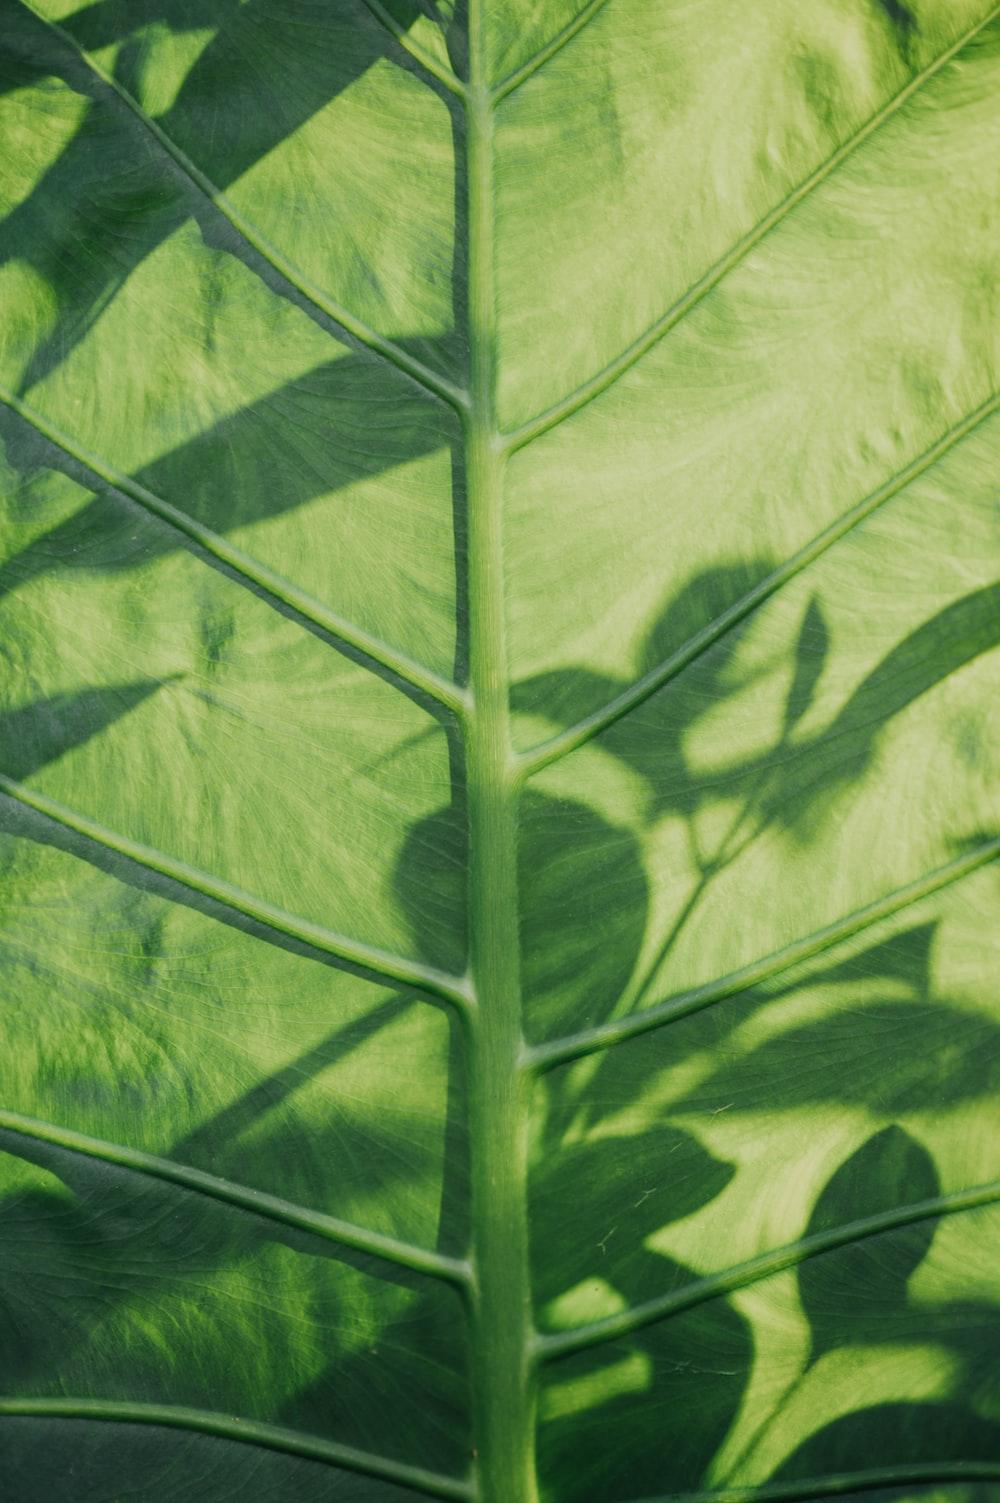 Colocasia esculenta leaf